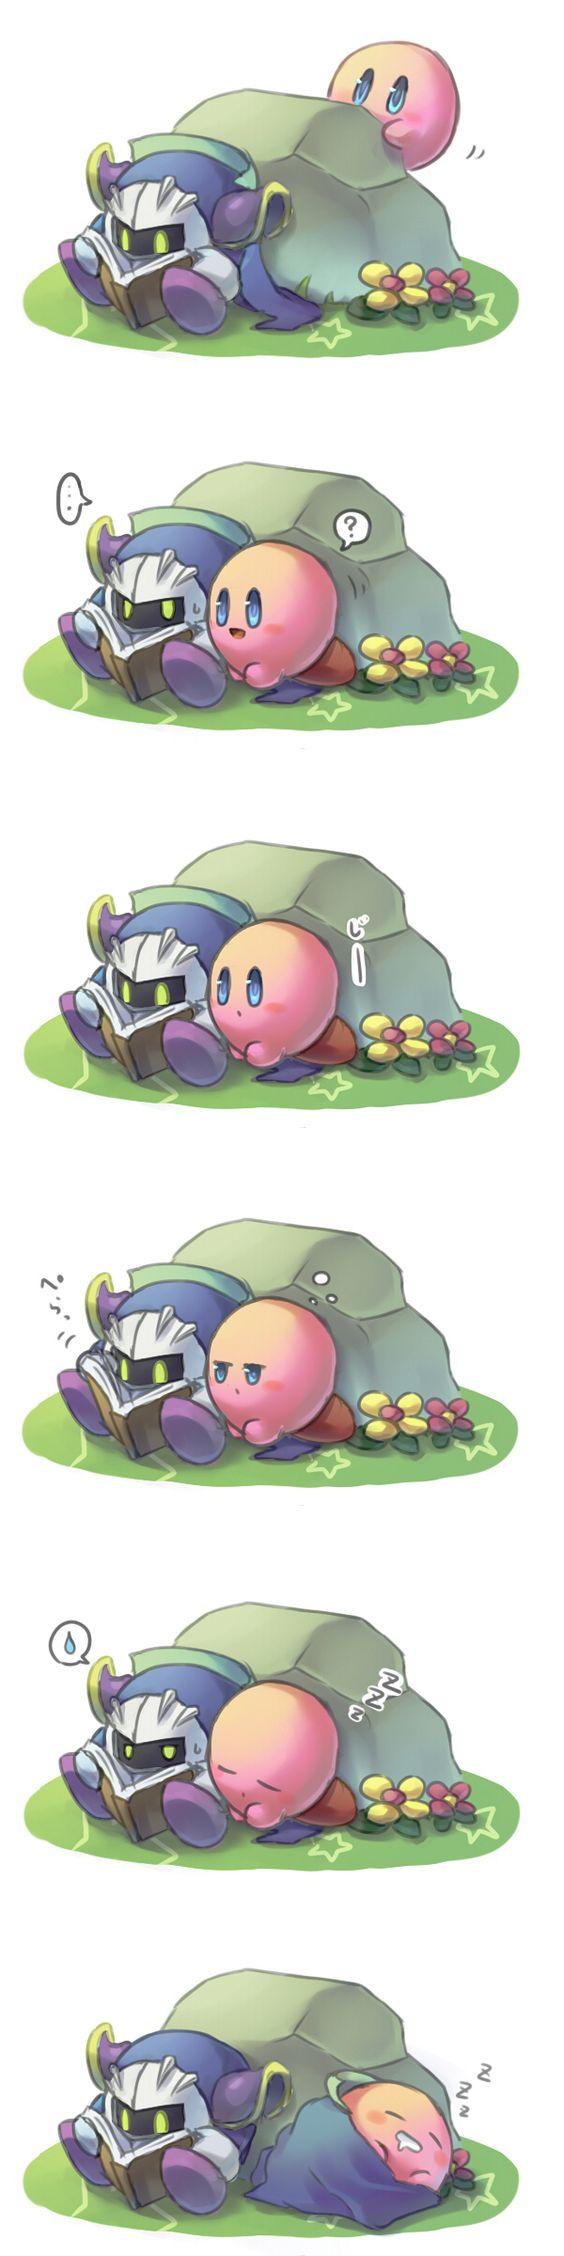 Meta Knight And Kirby Comics Meta Knight and Kirby....